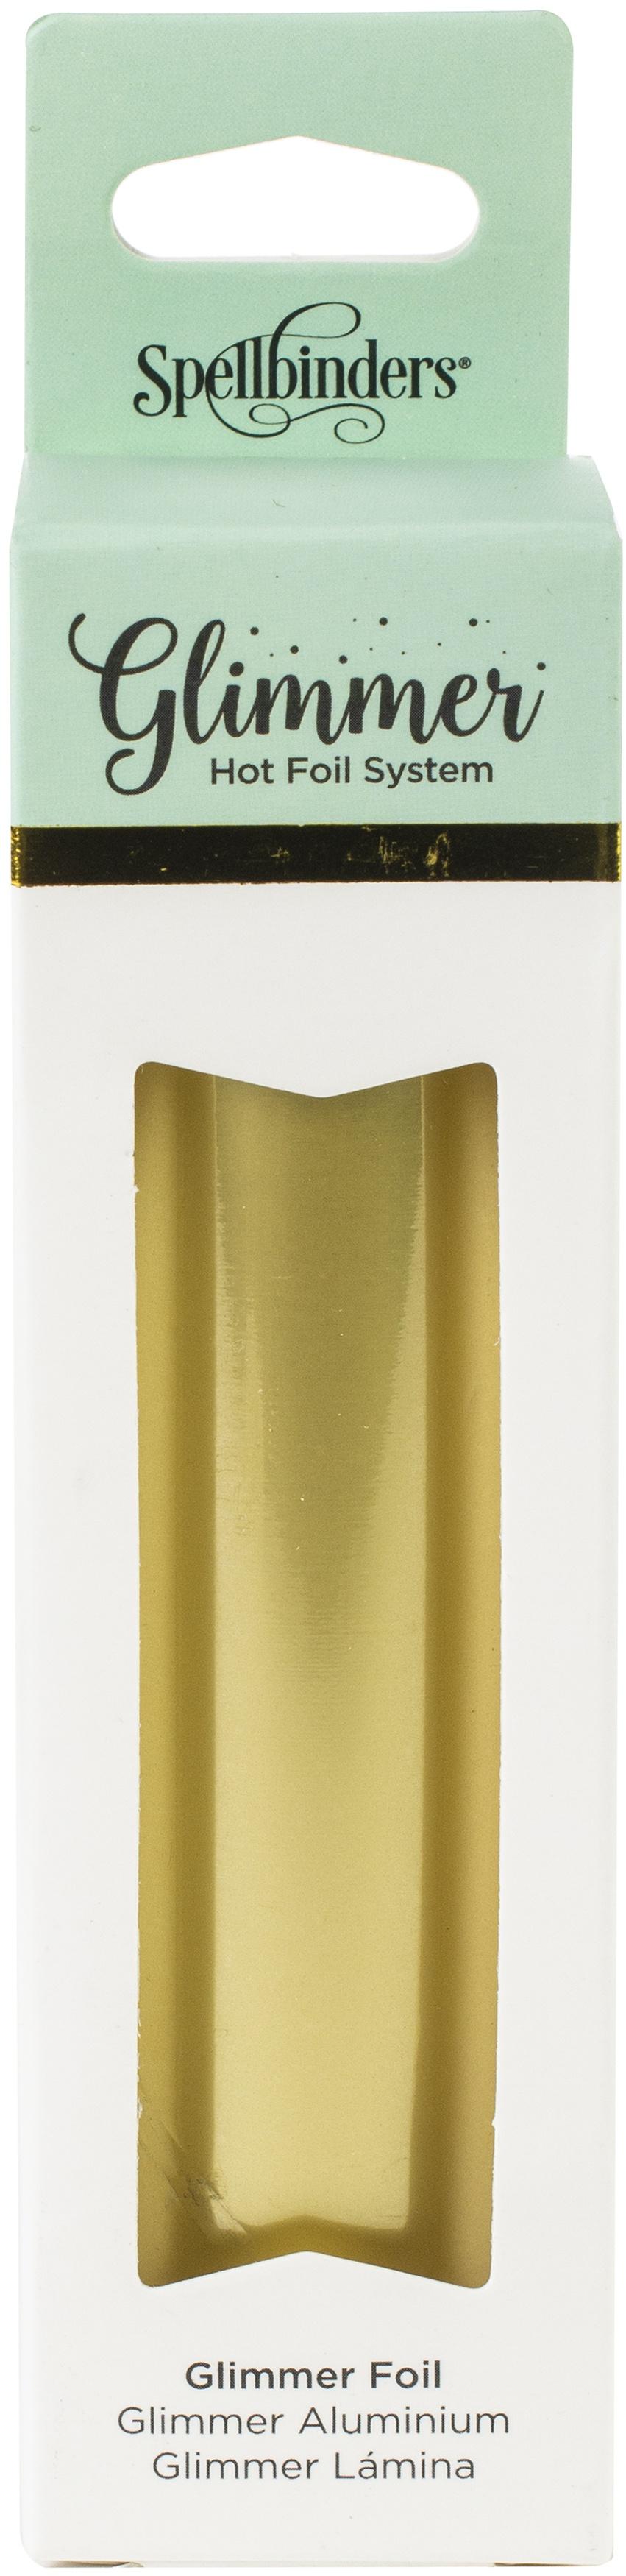 Glimmer Gold Foil Matte